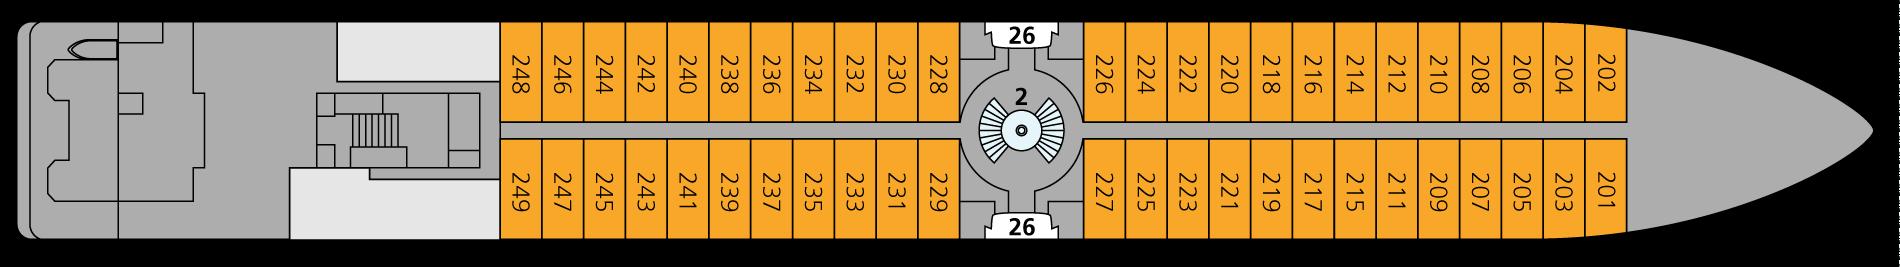 A-ROSA DONNA Deck 2